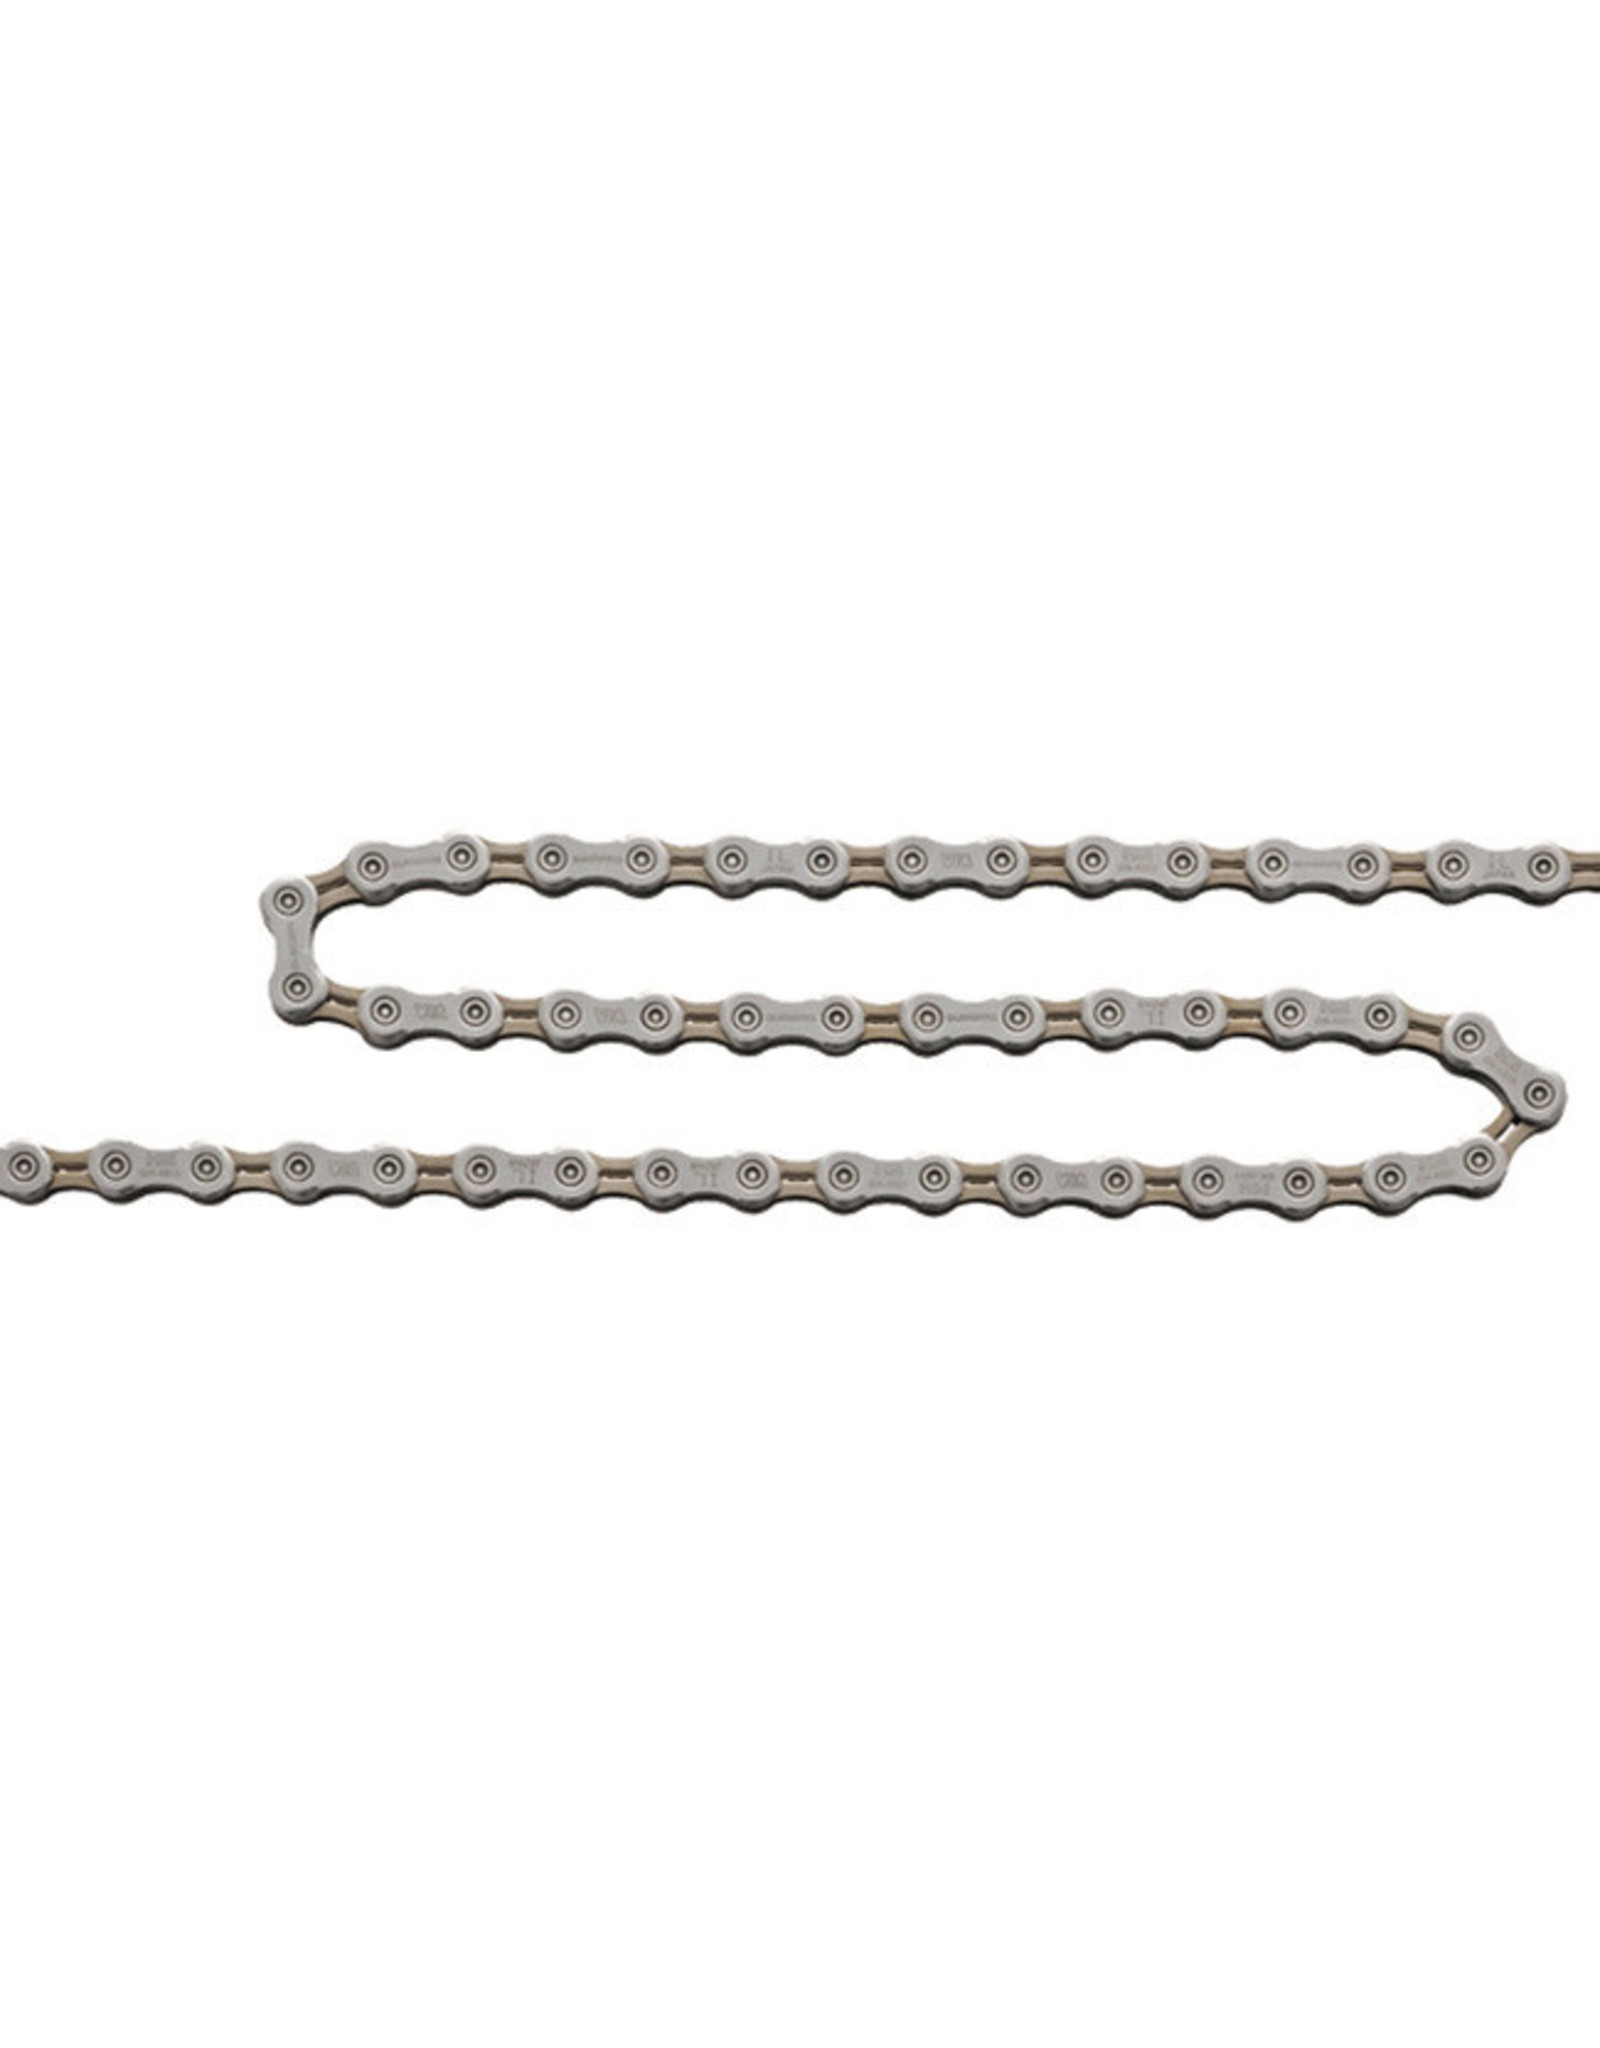 Shimano Chain Shimano 4601 Tiagra 10s 116 links